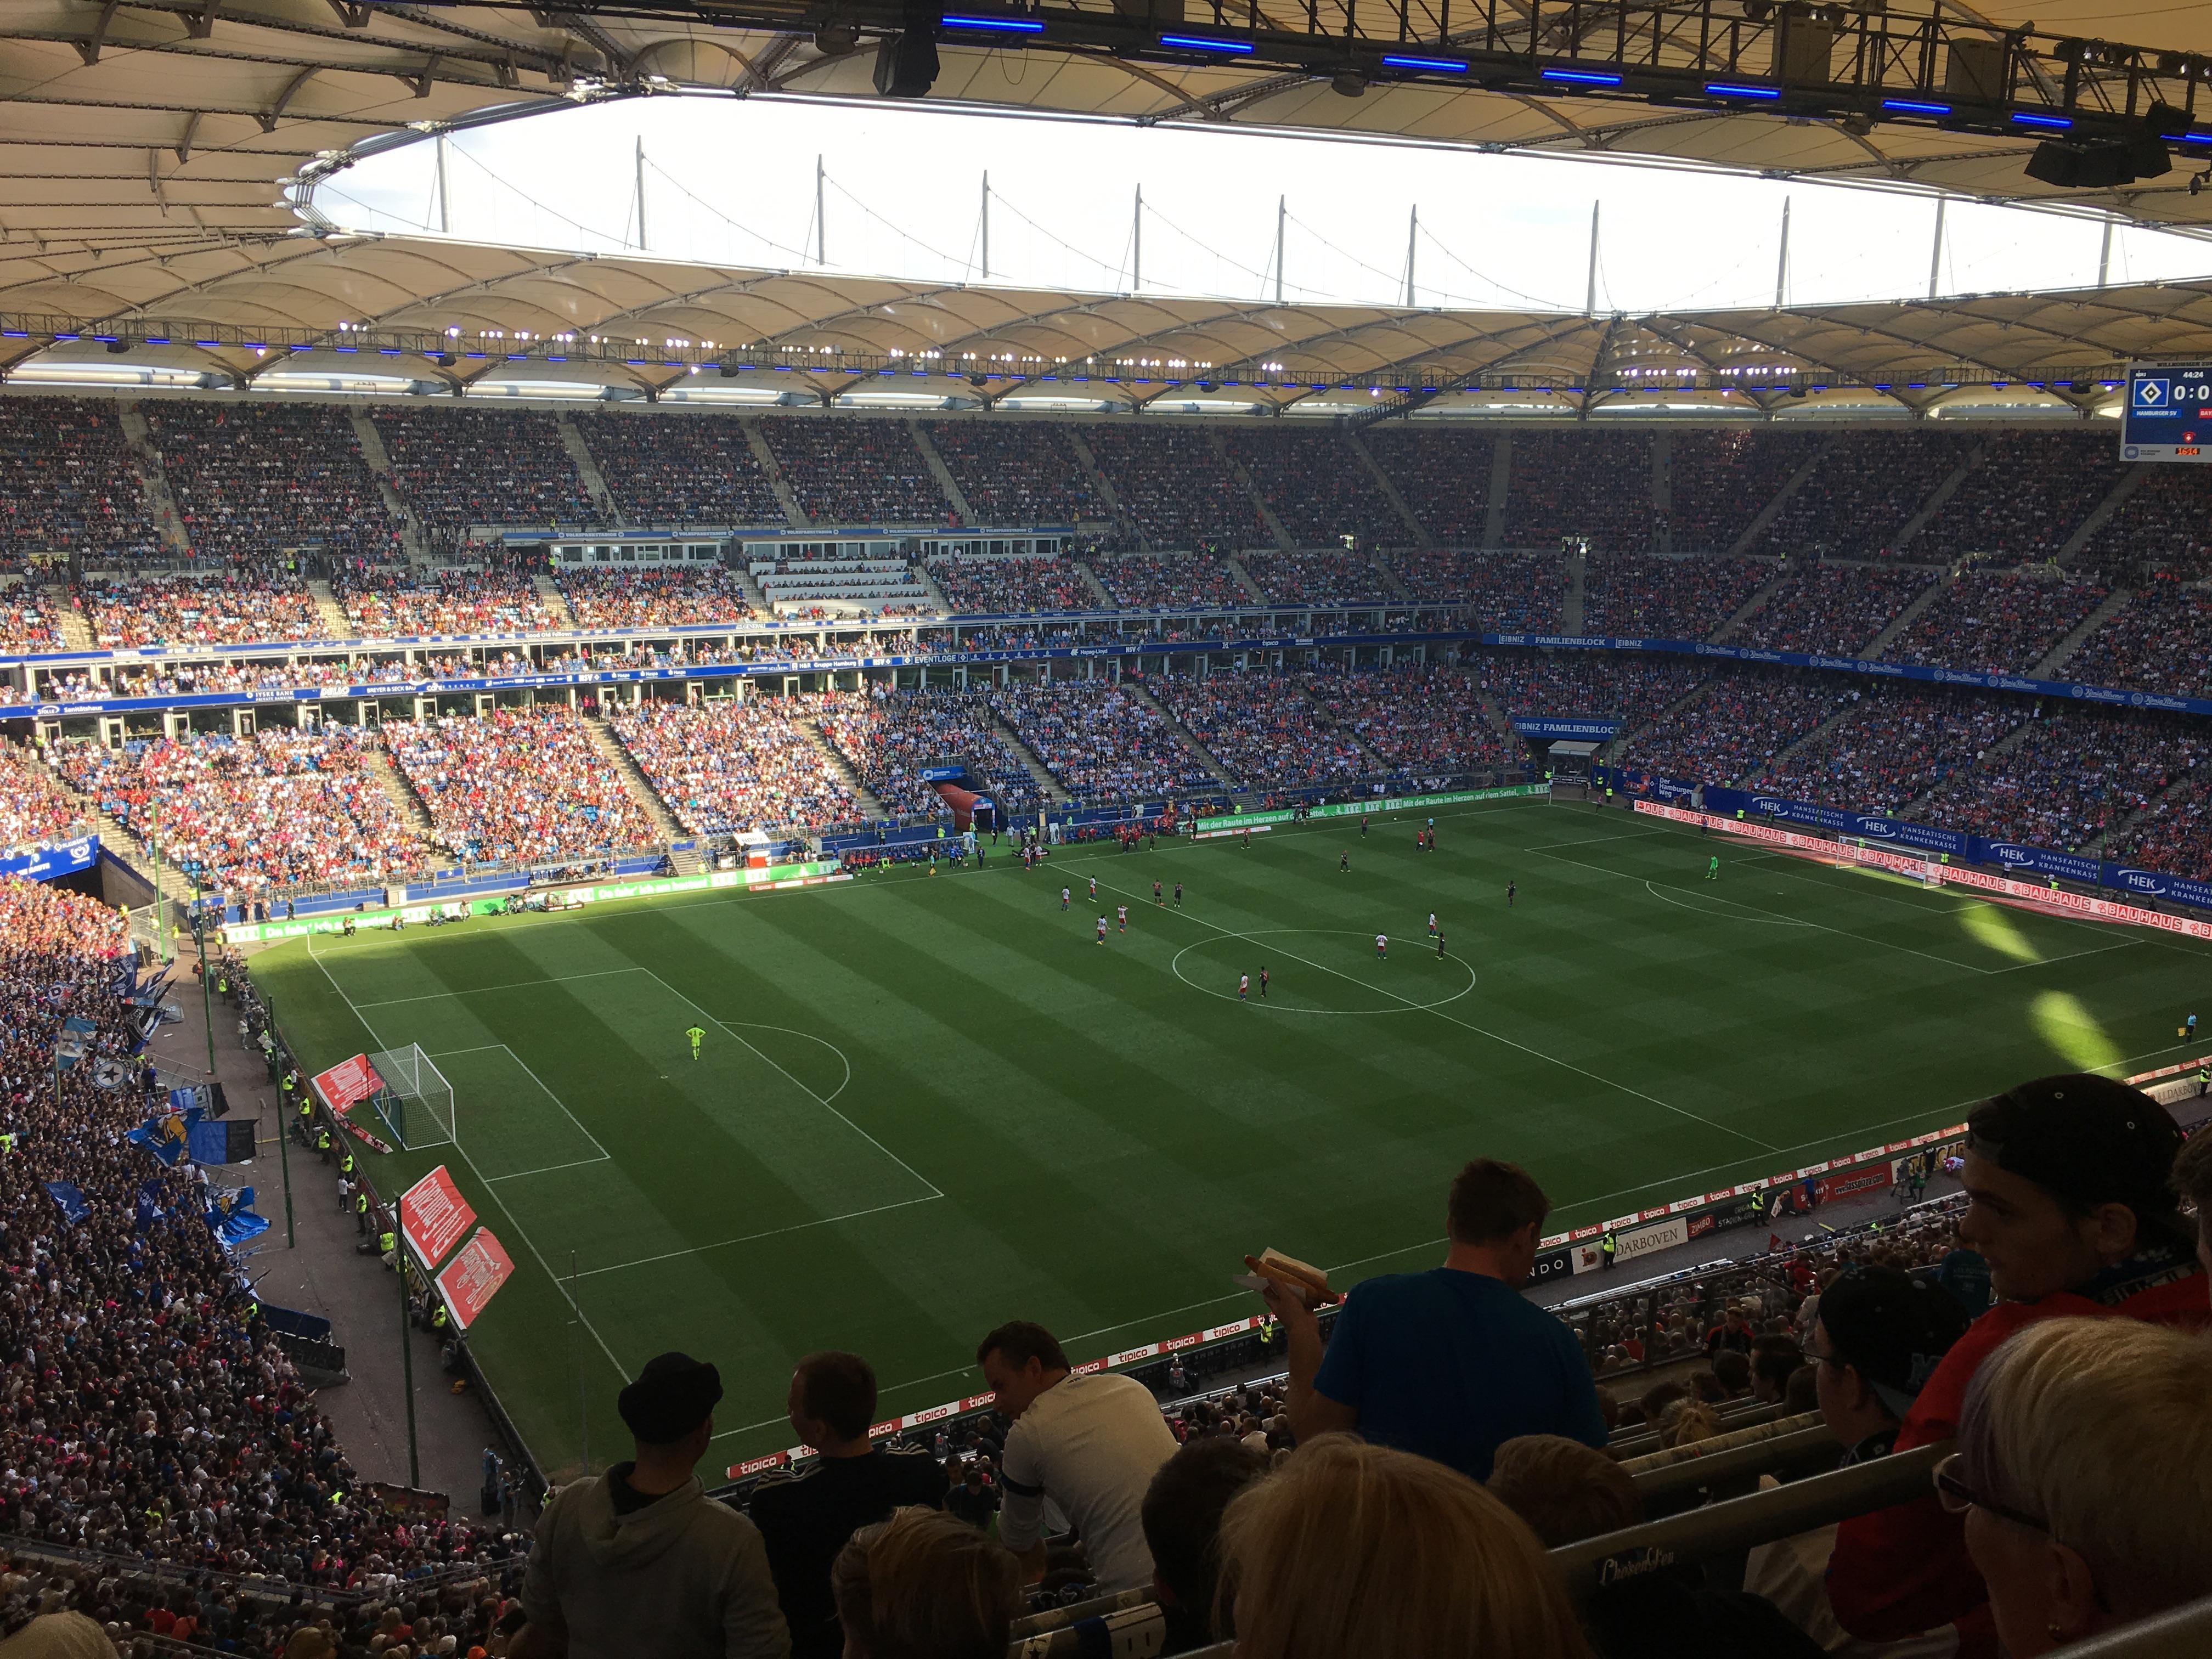 Volksparkstadion Section 21C Row 15 Seat 29